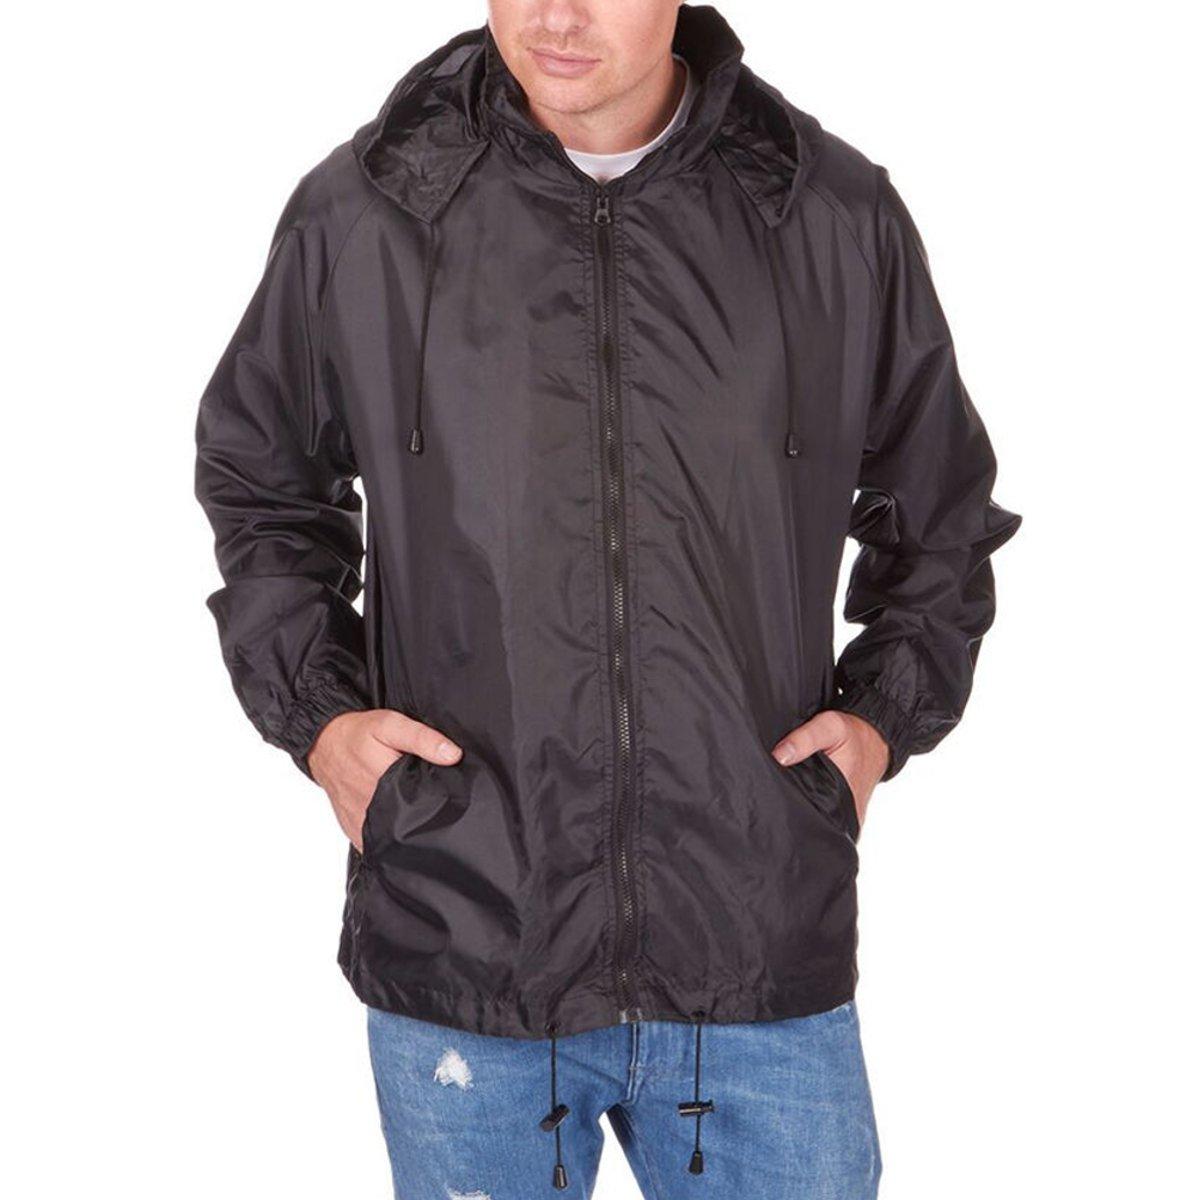 LUI SUI Men Women Reflective Hooded Raincoat Suits Windproof Waterproof Camping Hiking Cycling Jacket//Trouser Suits Rainwear